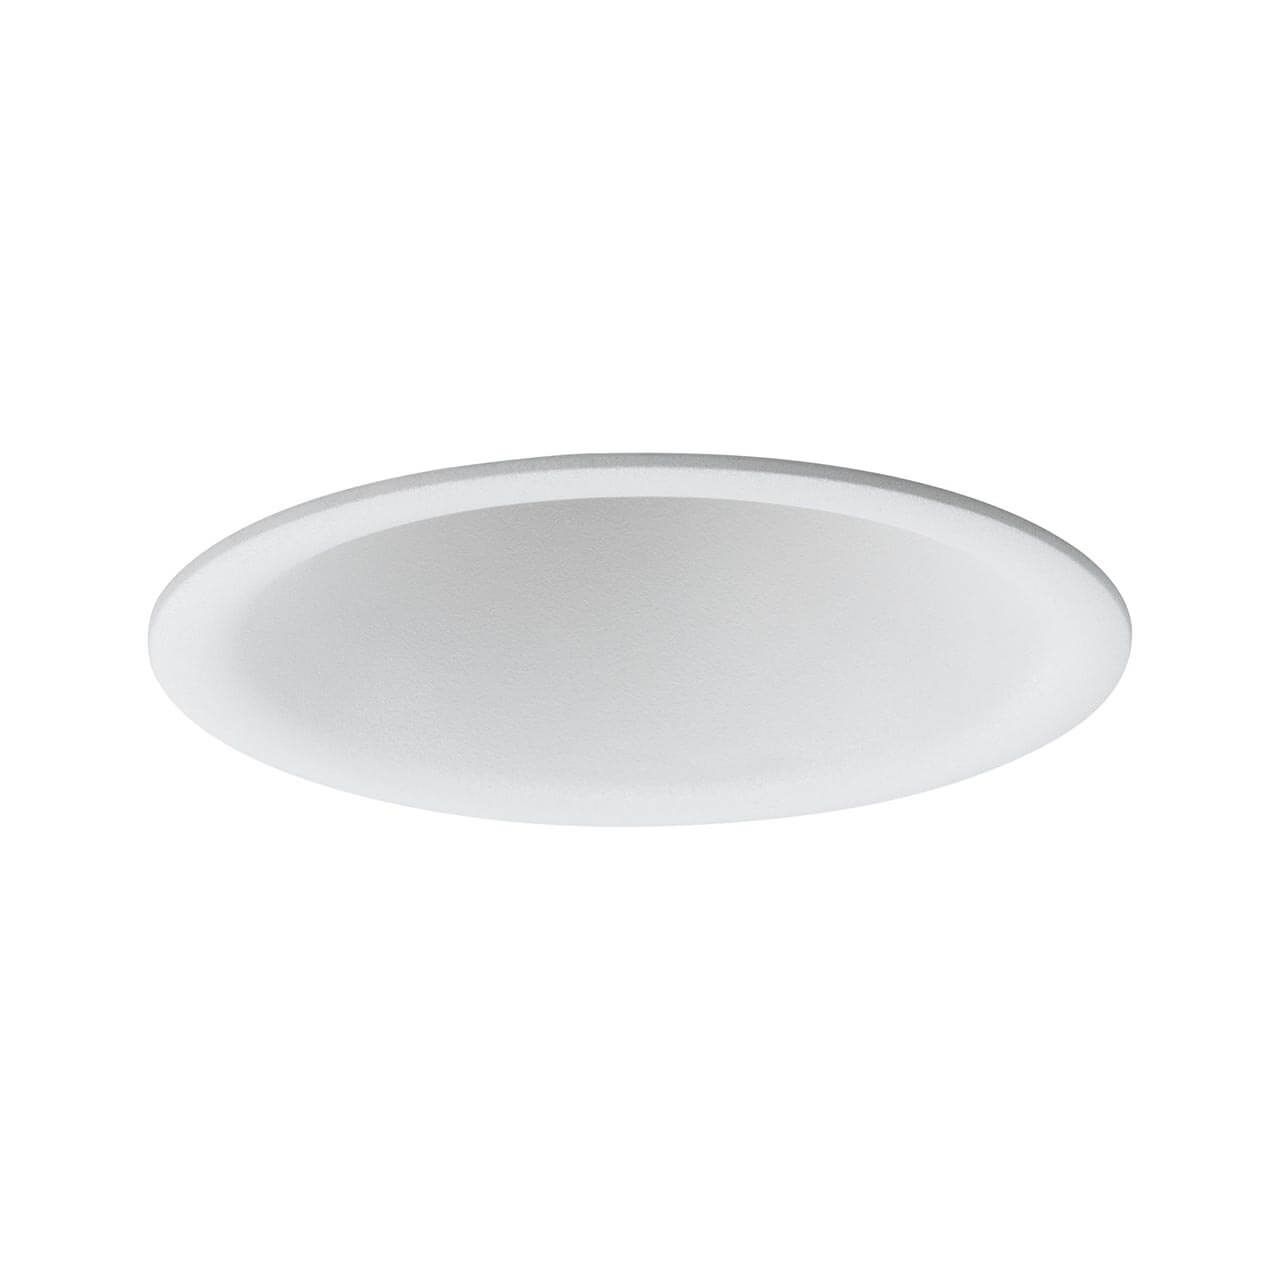 Светильник Paulmann 93418 Cymbal Coin